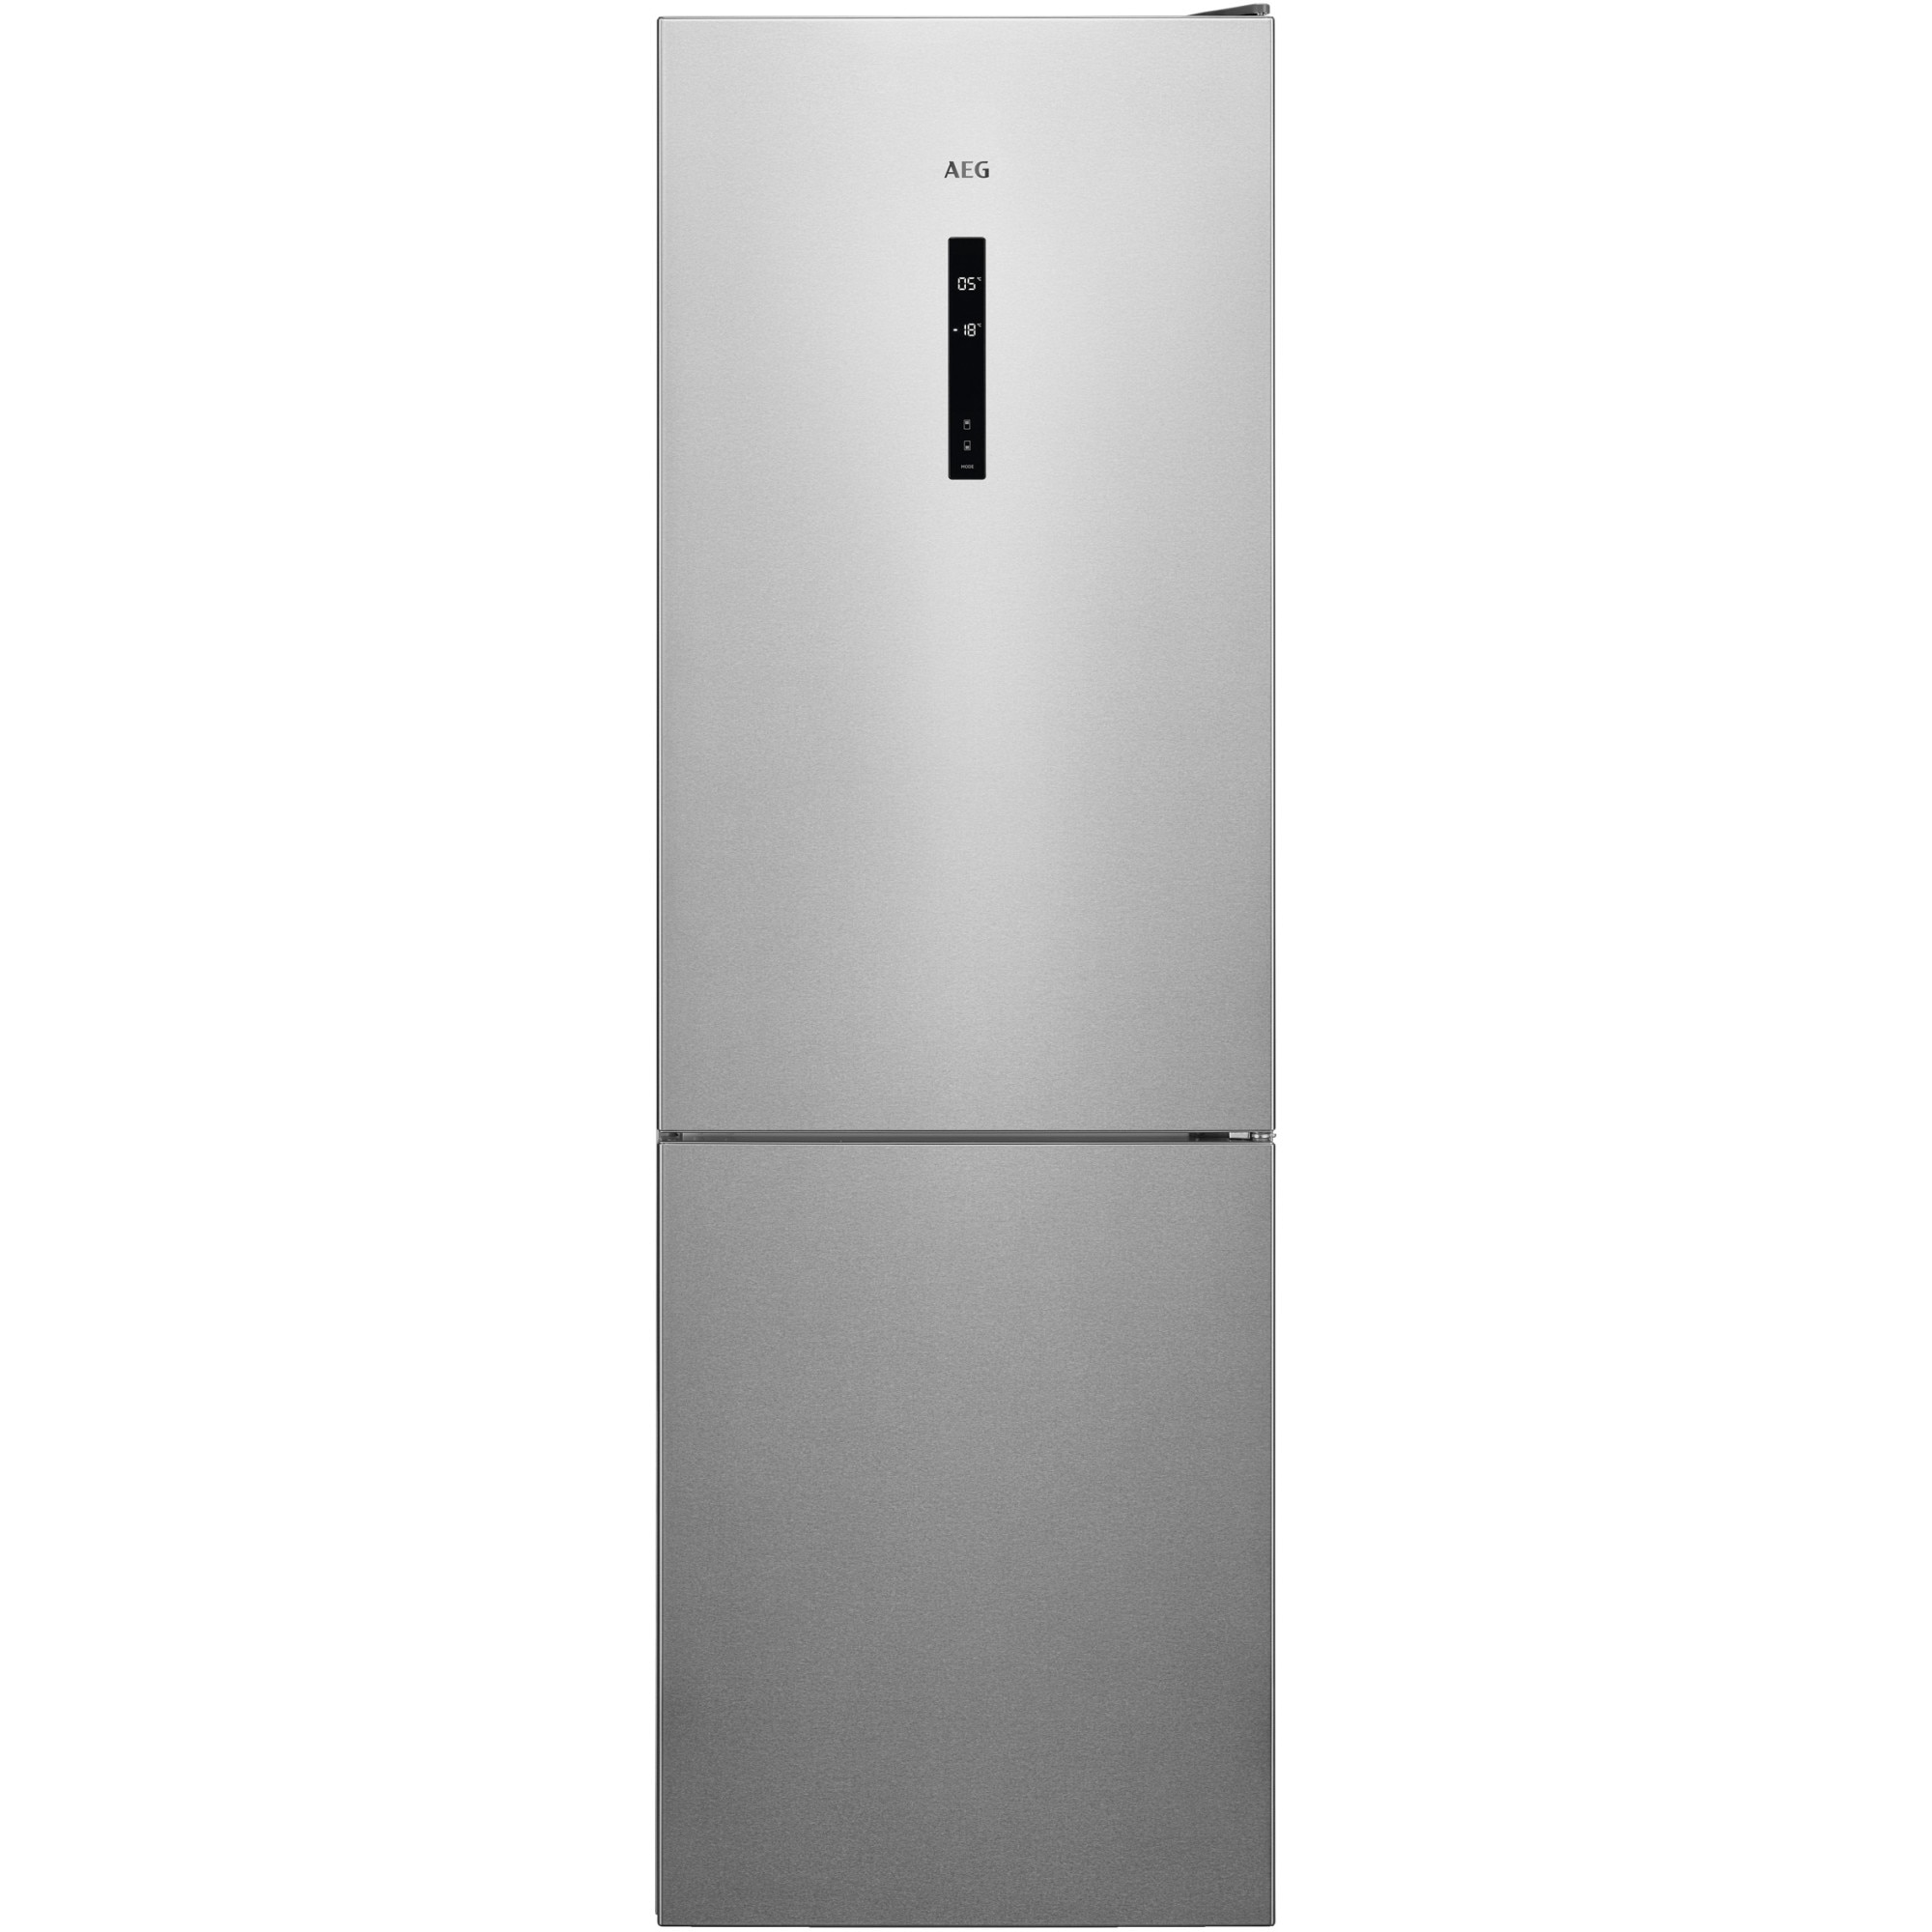 Fotografie Combina frigorifica AEG RCB632E5MX, 324 l, NoFrost, Display, Clasa A++, H 186 cm, Inox